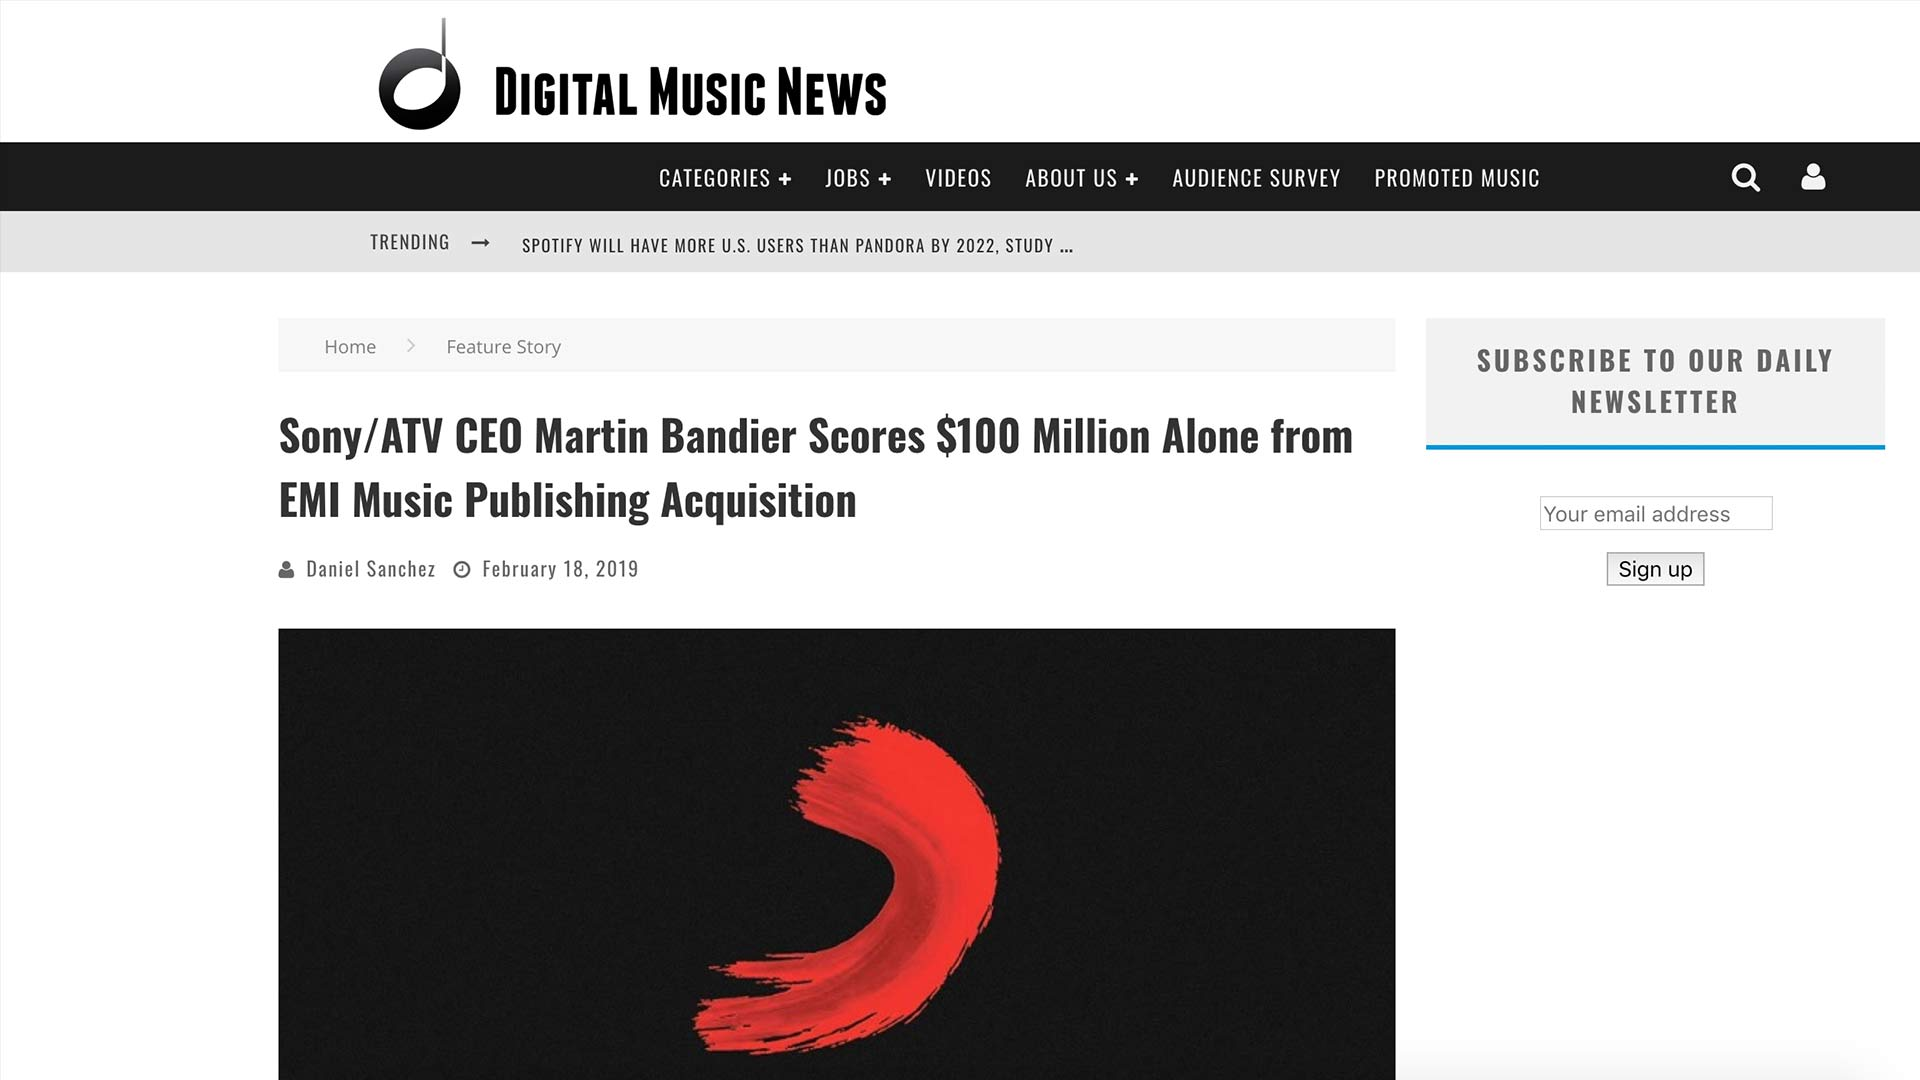 Fairness Rocks News Sony/ATV CEO Martin Bandier Scores $100 Million Alone from EMI Music Publishing Acquisition